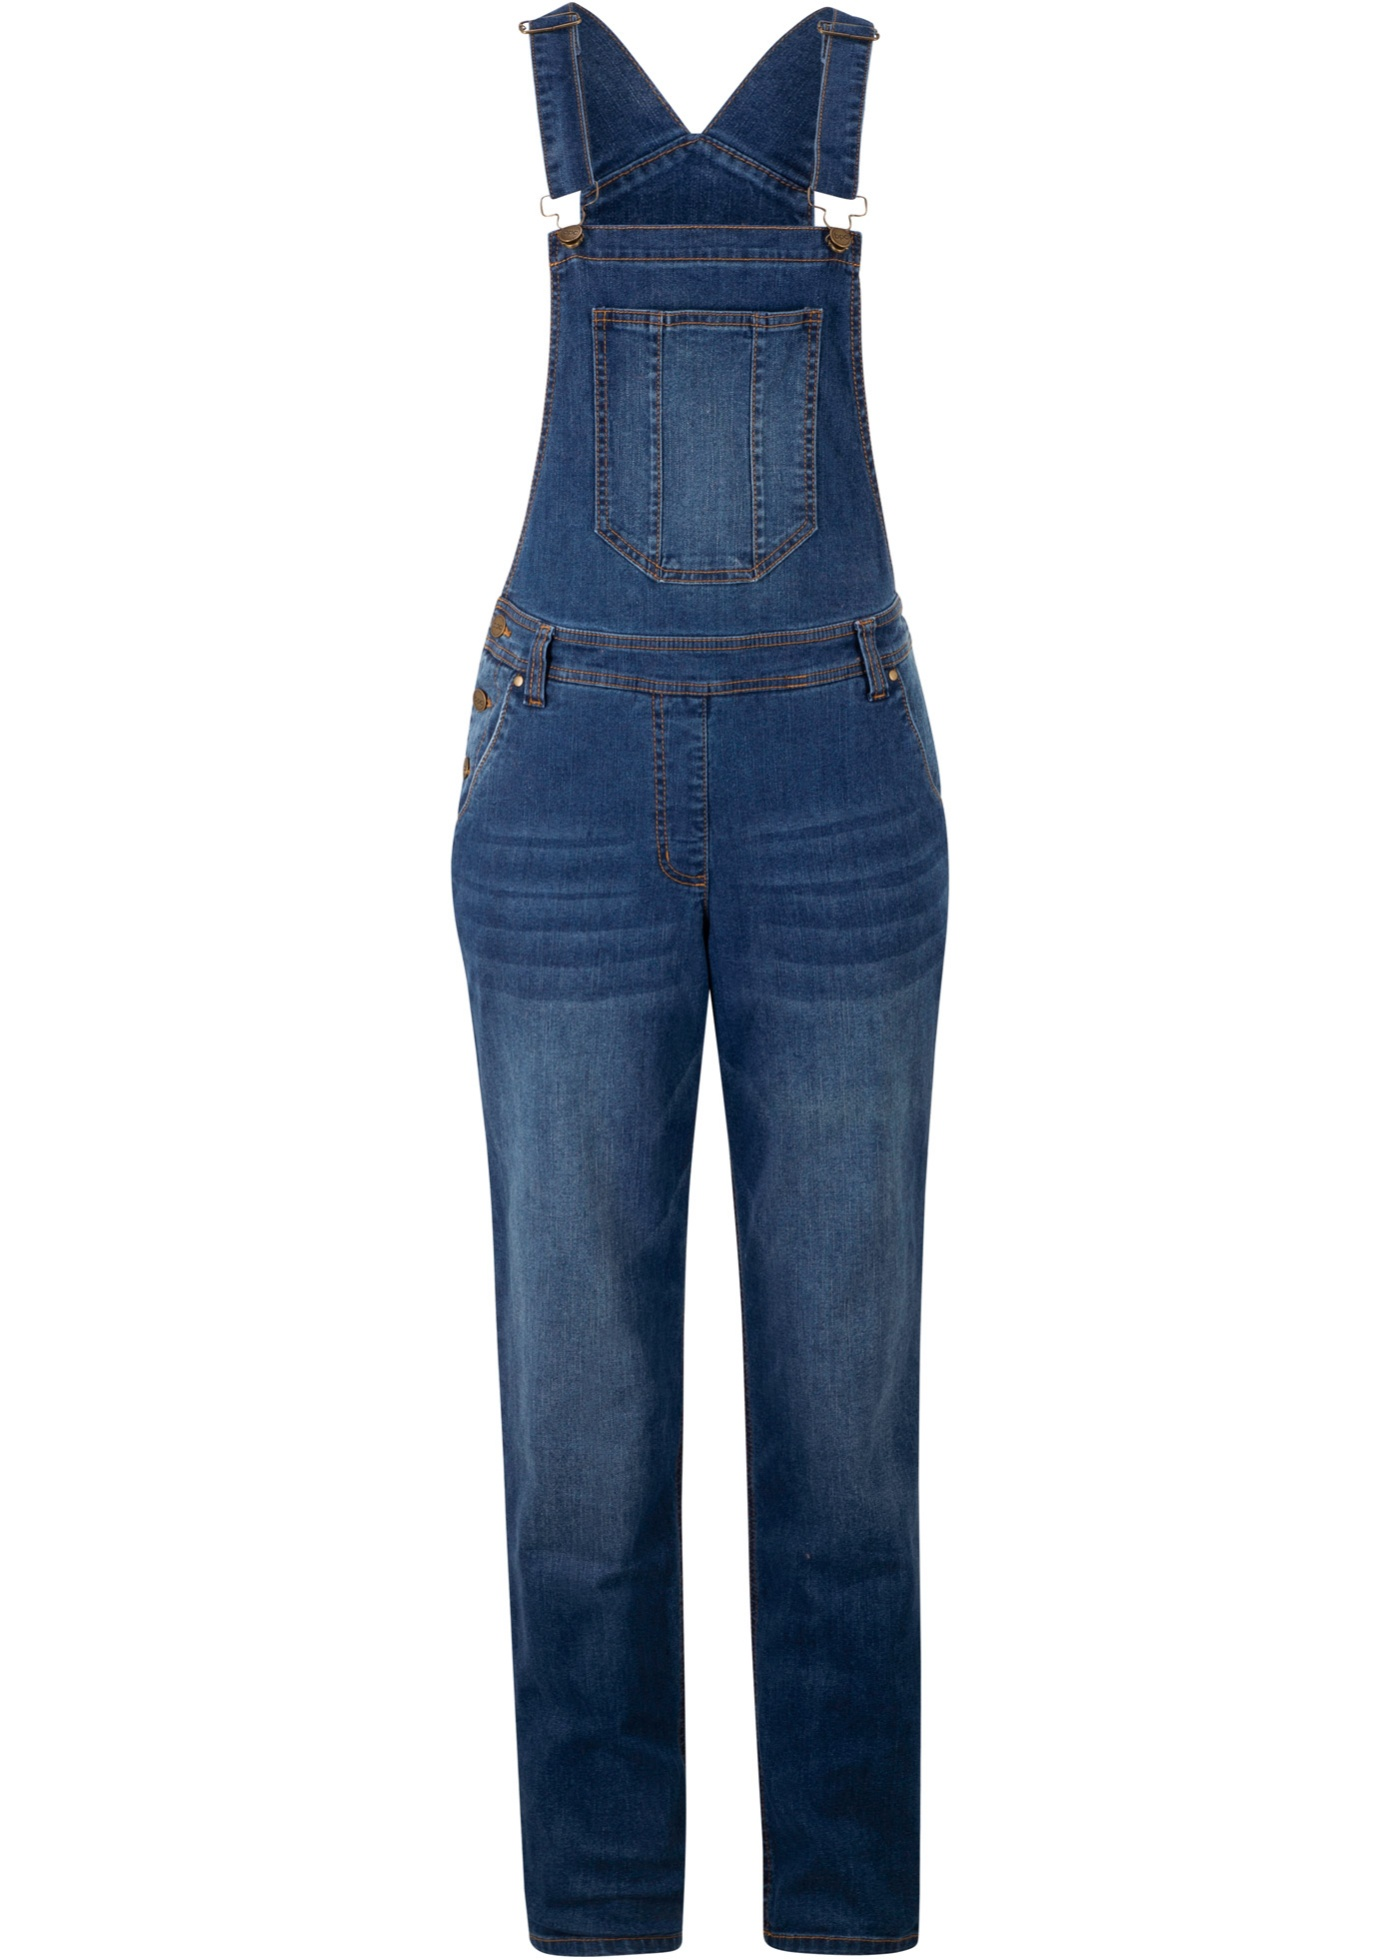 Hosen - Jeans Latzhose mit extra Weite › bonprix › blau  - Onlineshop Bonprix